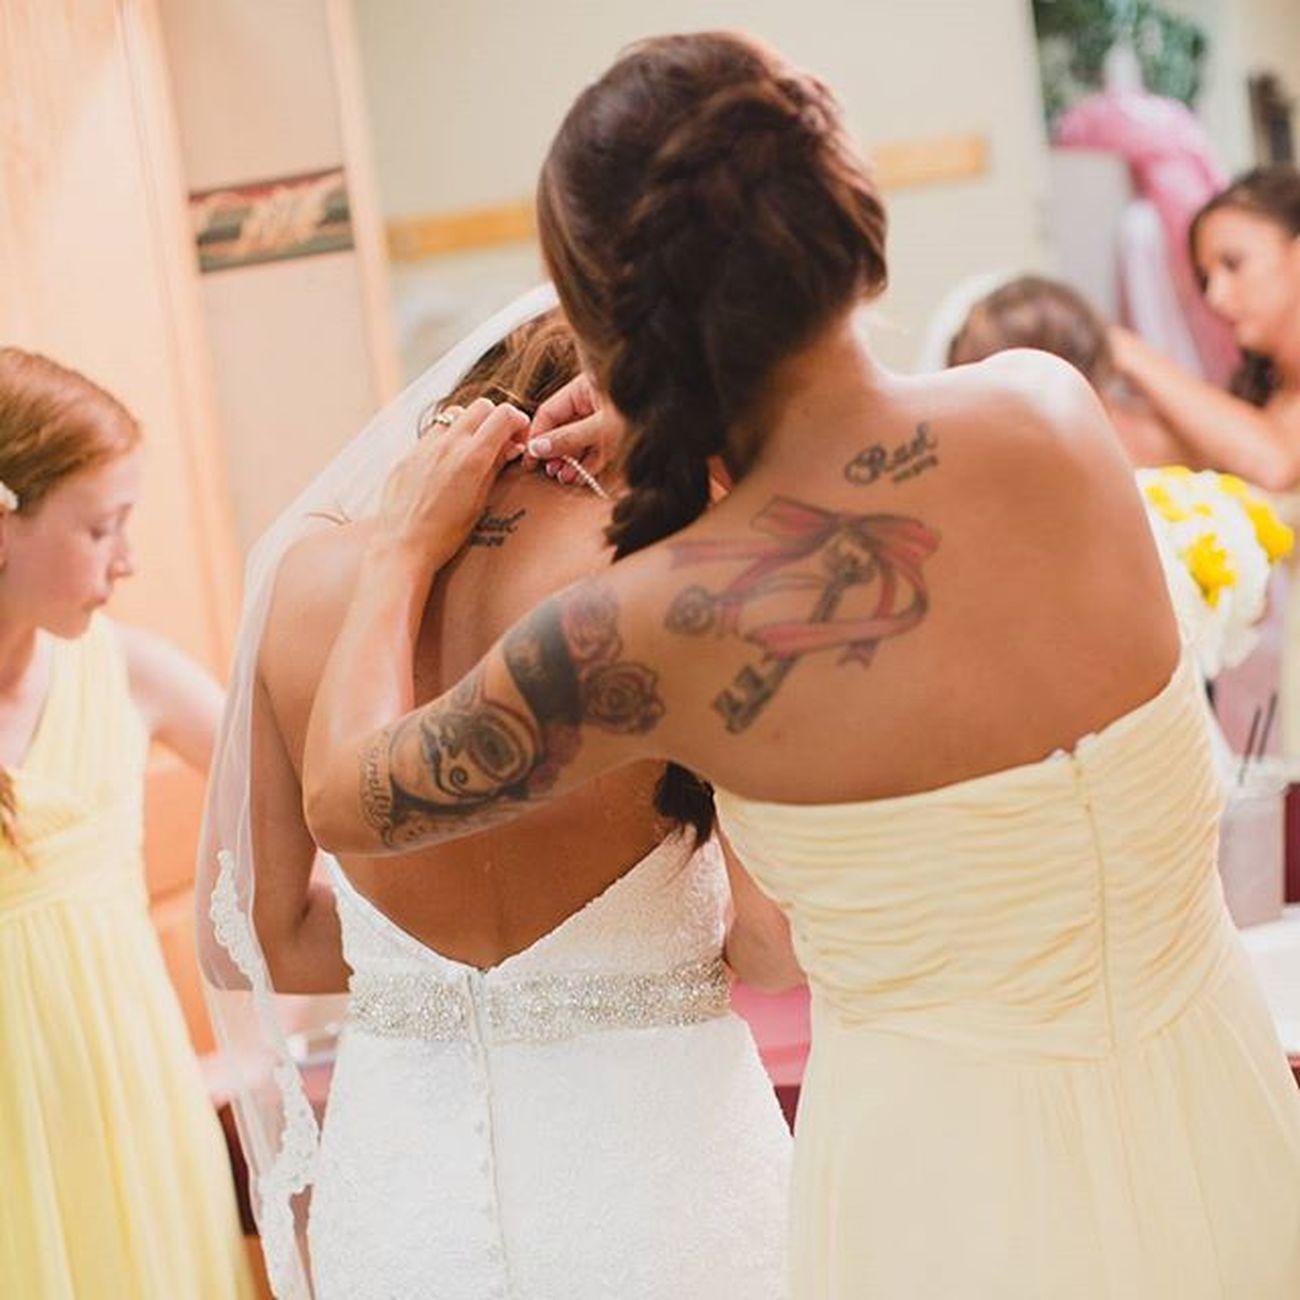 Alexanderwedding Bride Maidofhonor Wedding Missedourmom Beautifulday Ink Womenwithink Tattowomen Tattoos